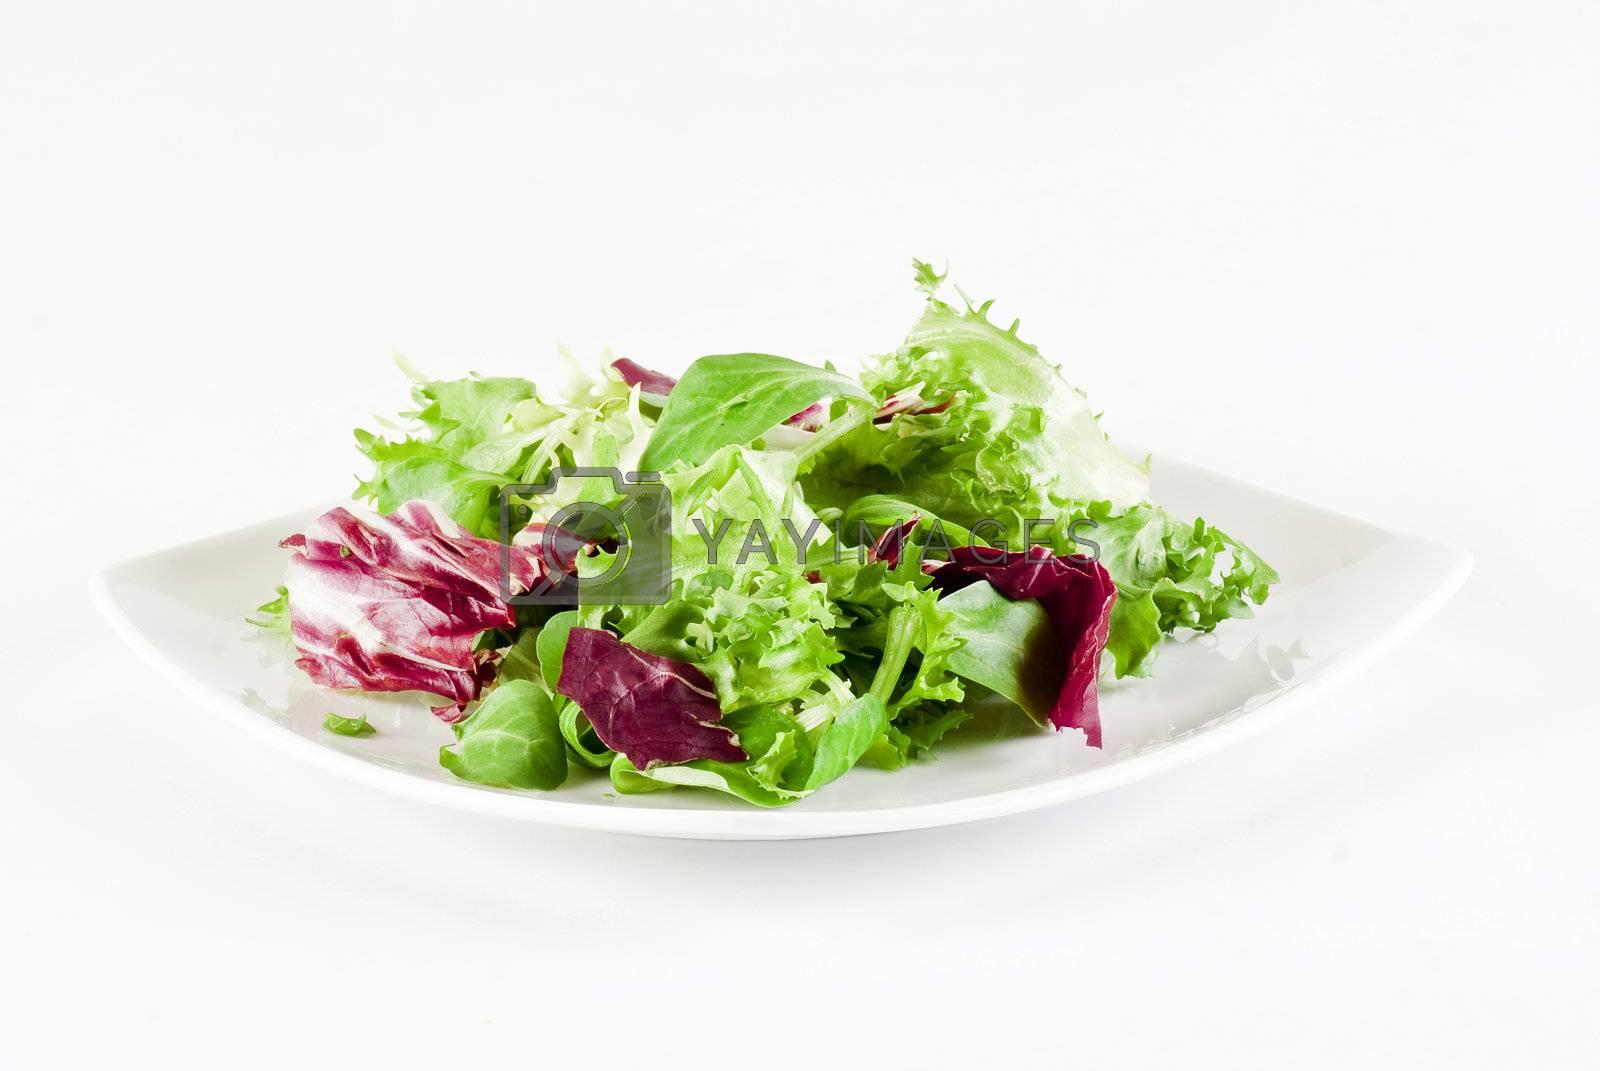 Crispy salad  by caldix